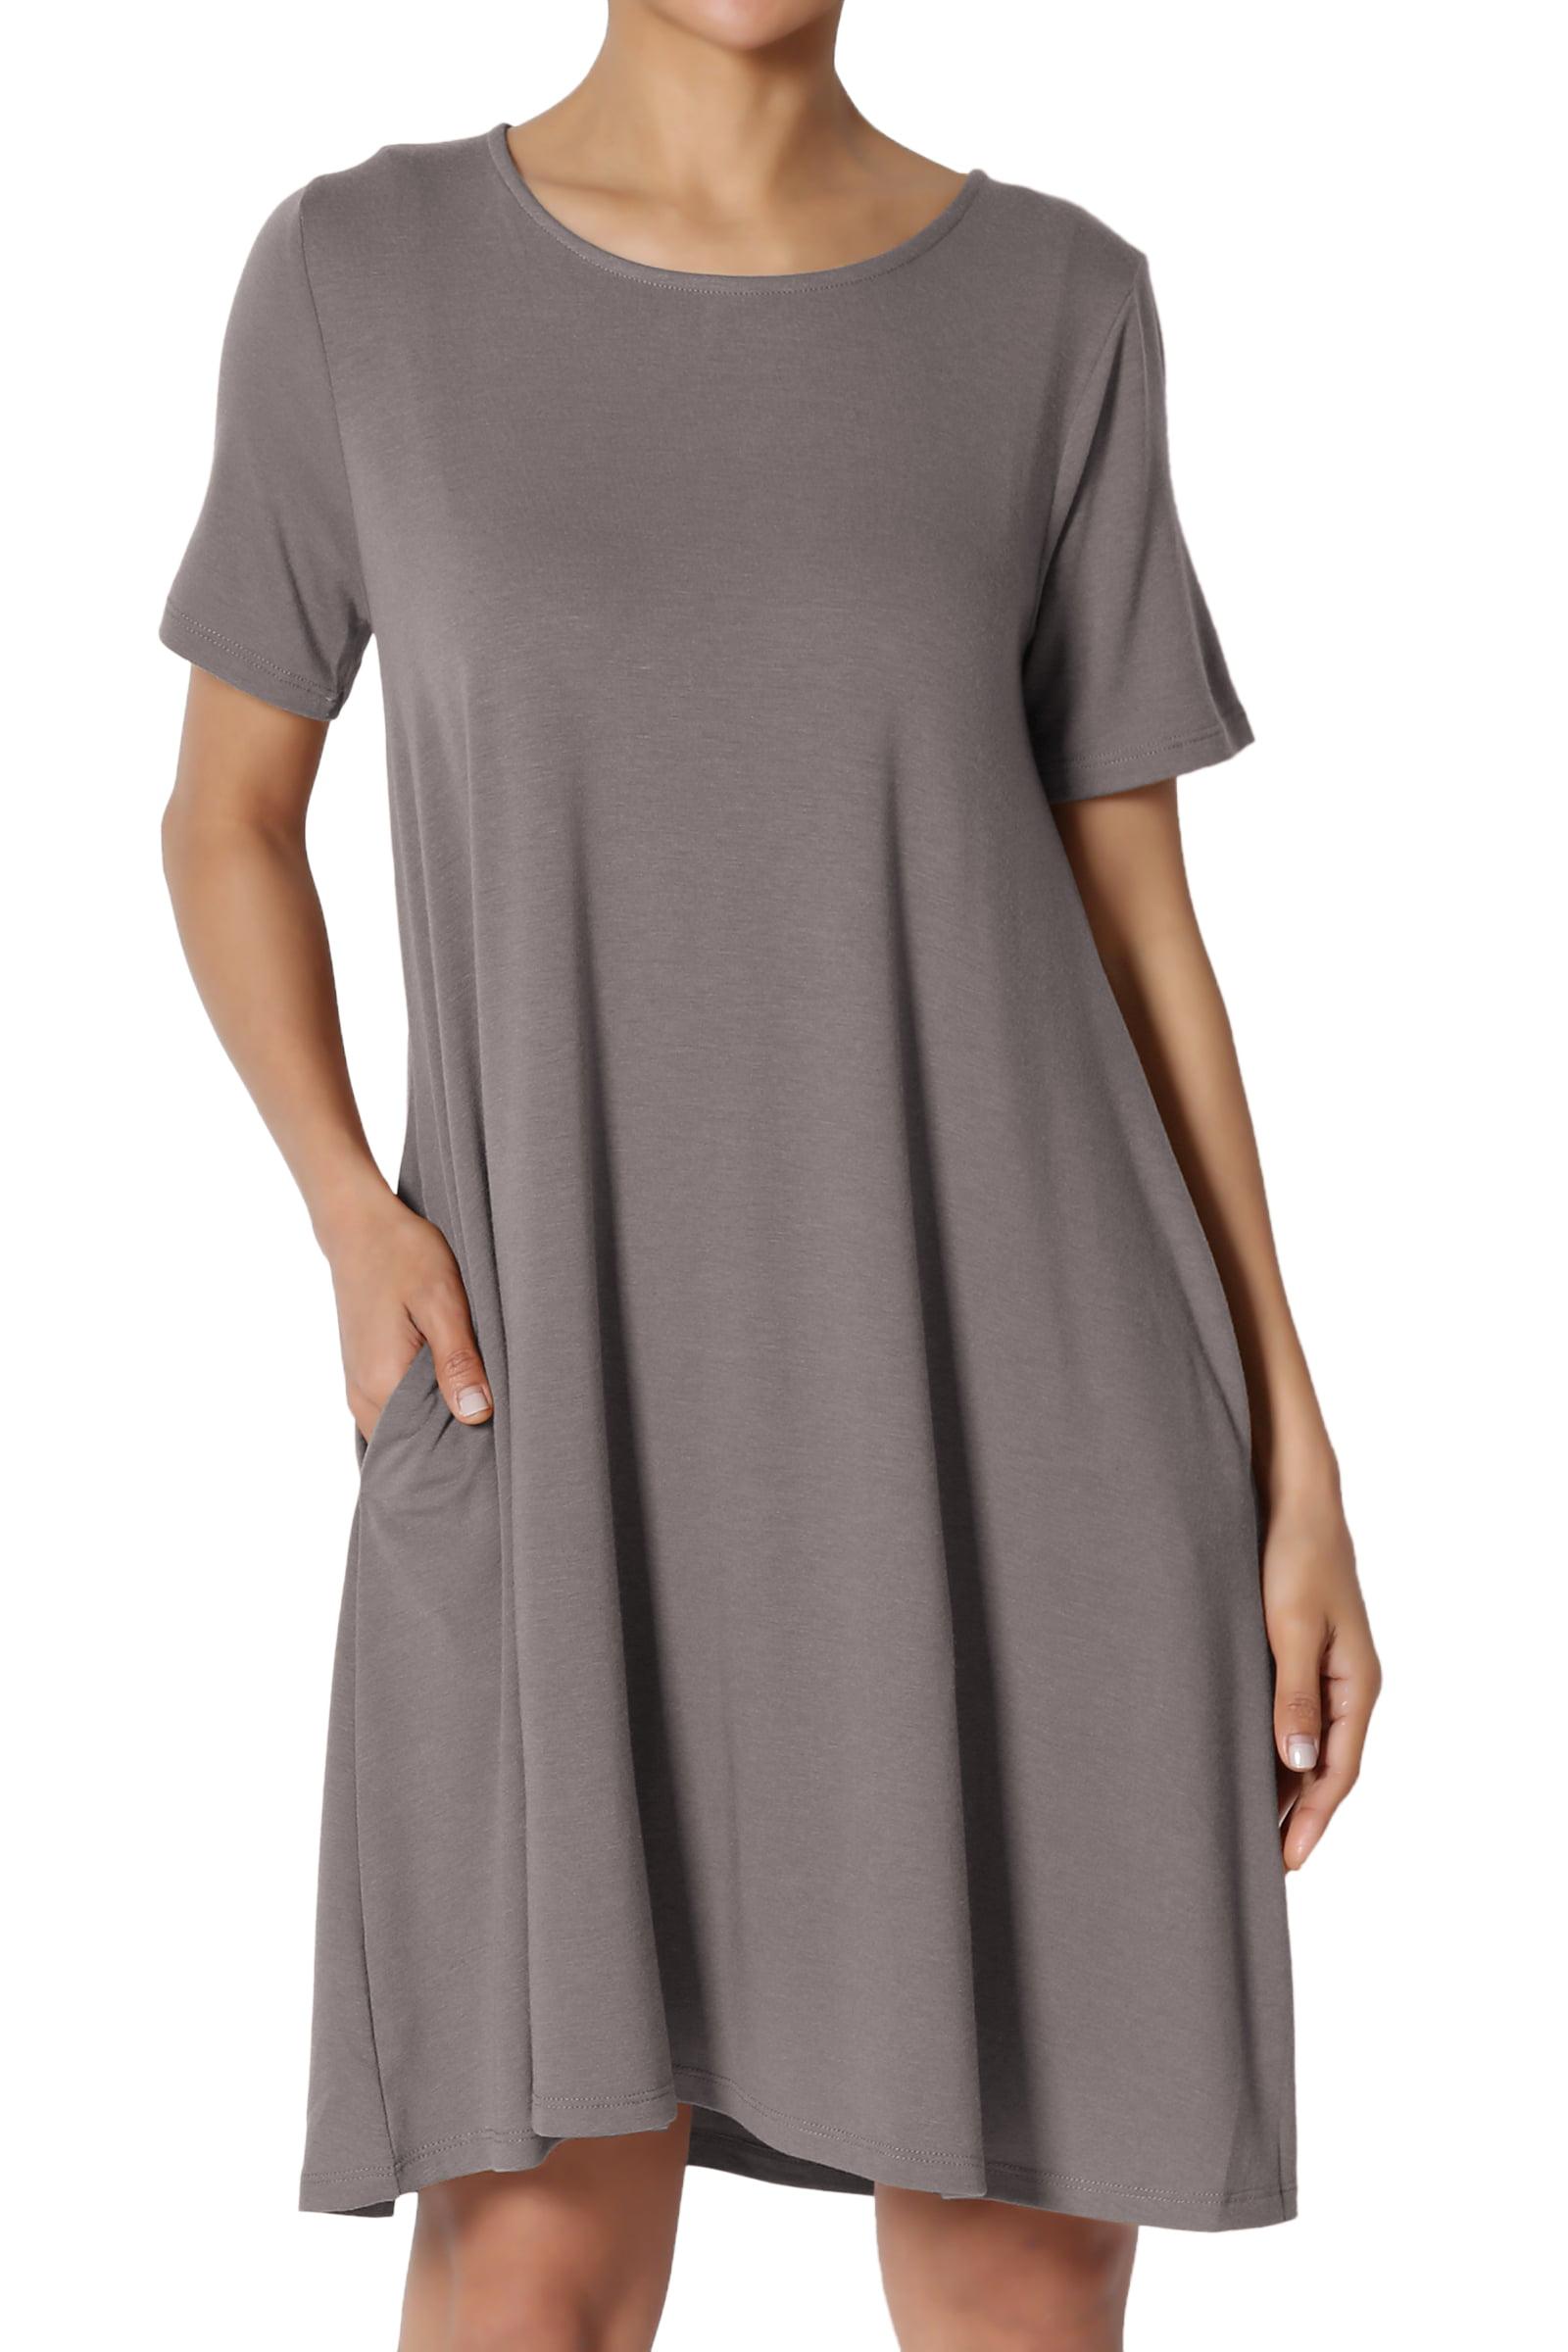 TheMogan Women's PLUS Short Sleeve Round Neck Pocket Flared A-Line Long Tunic Top